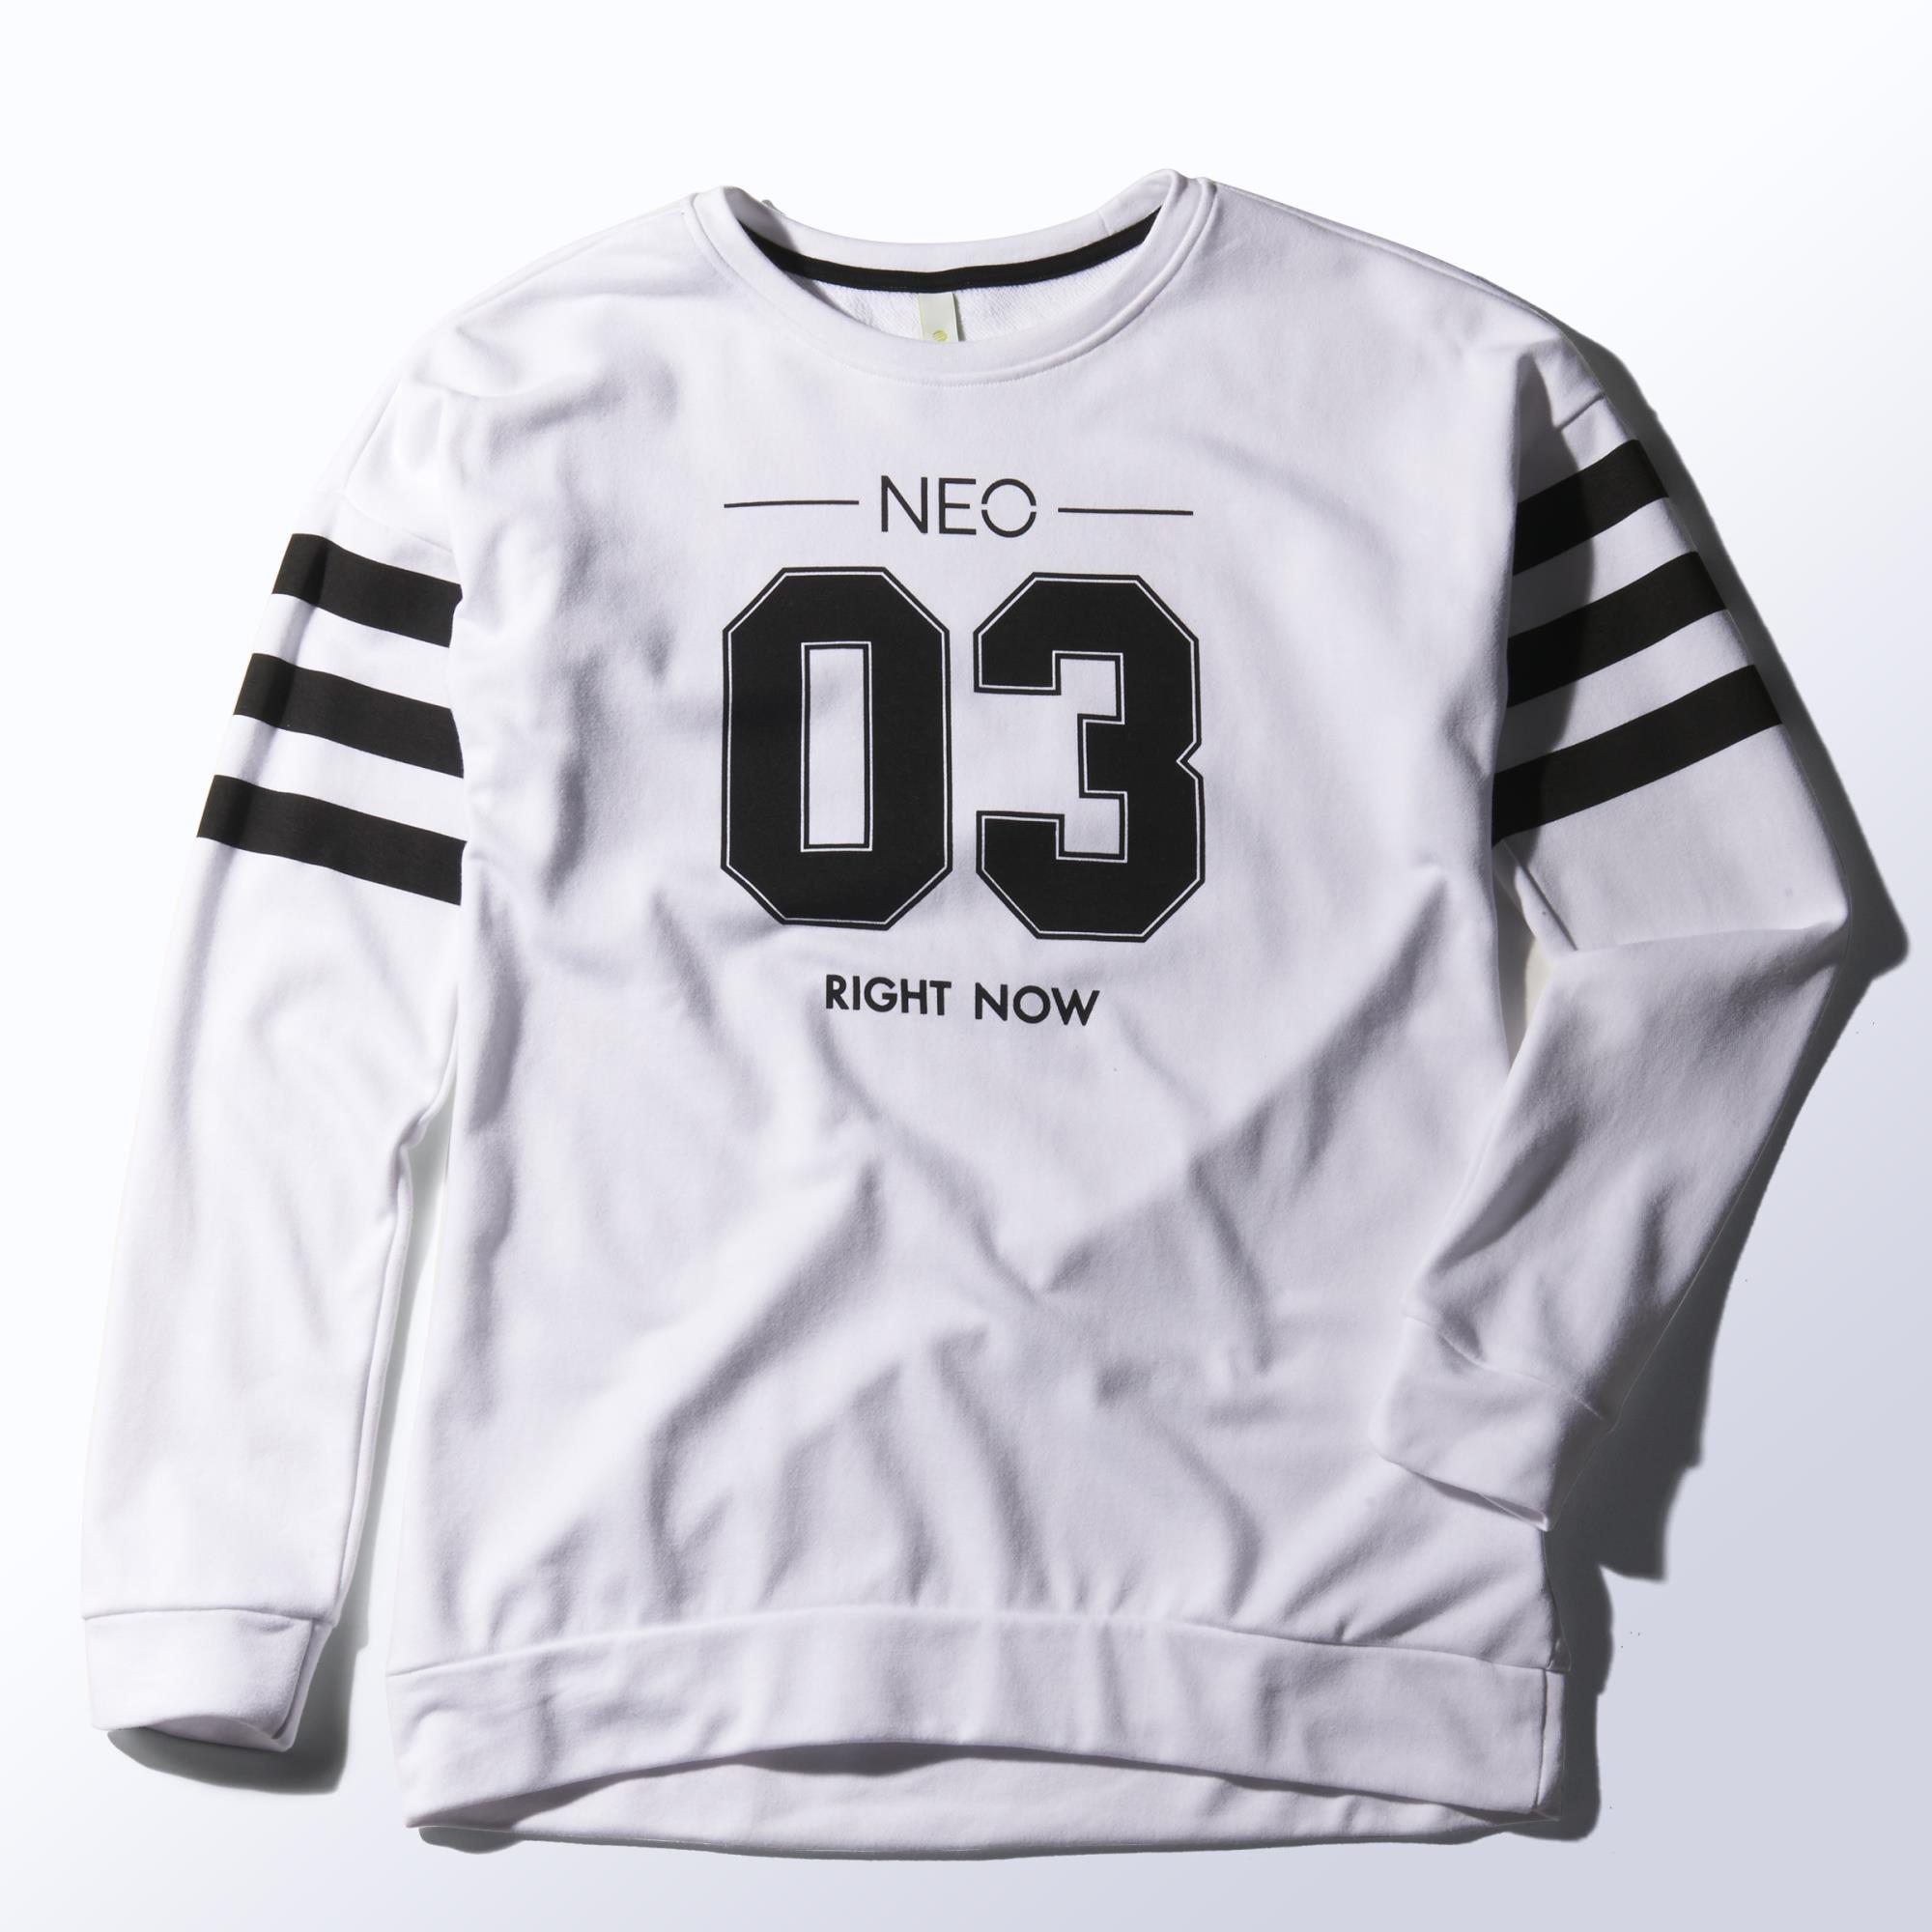 Adidas right now sweatshirt